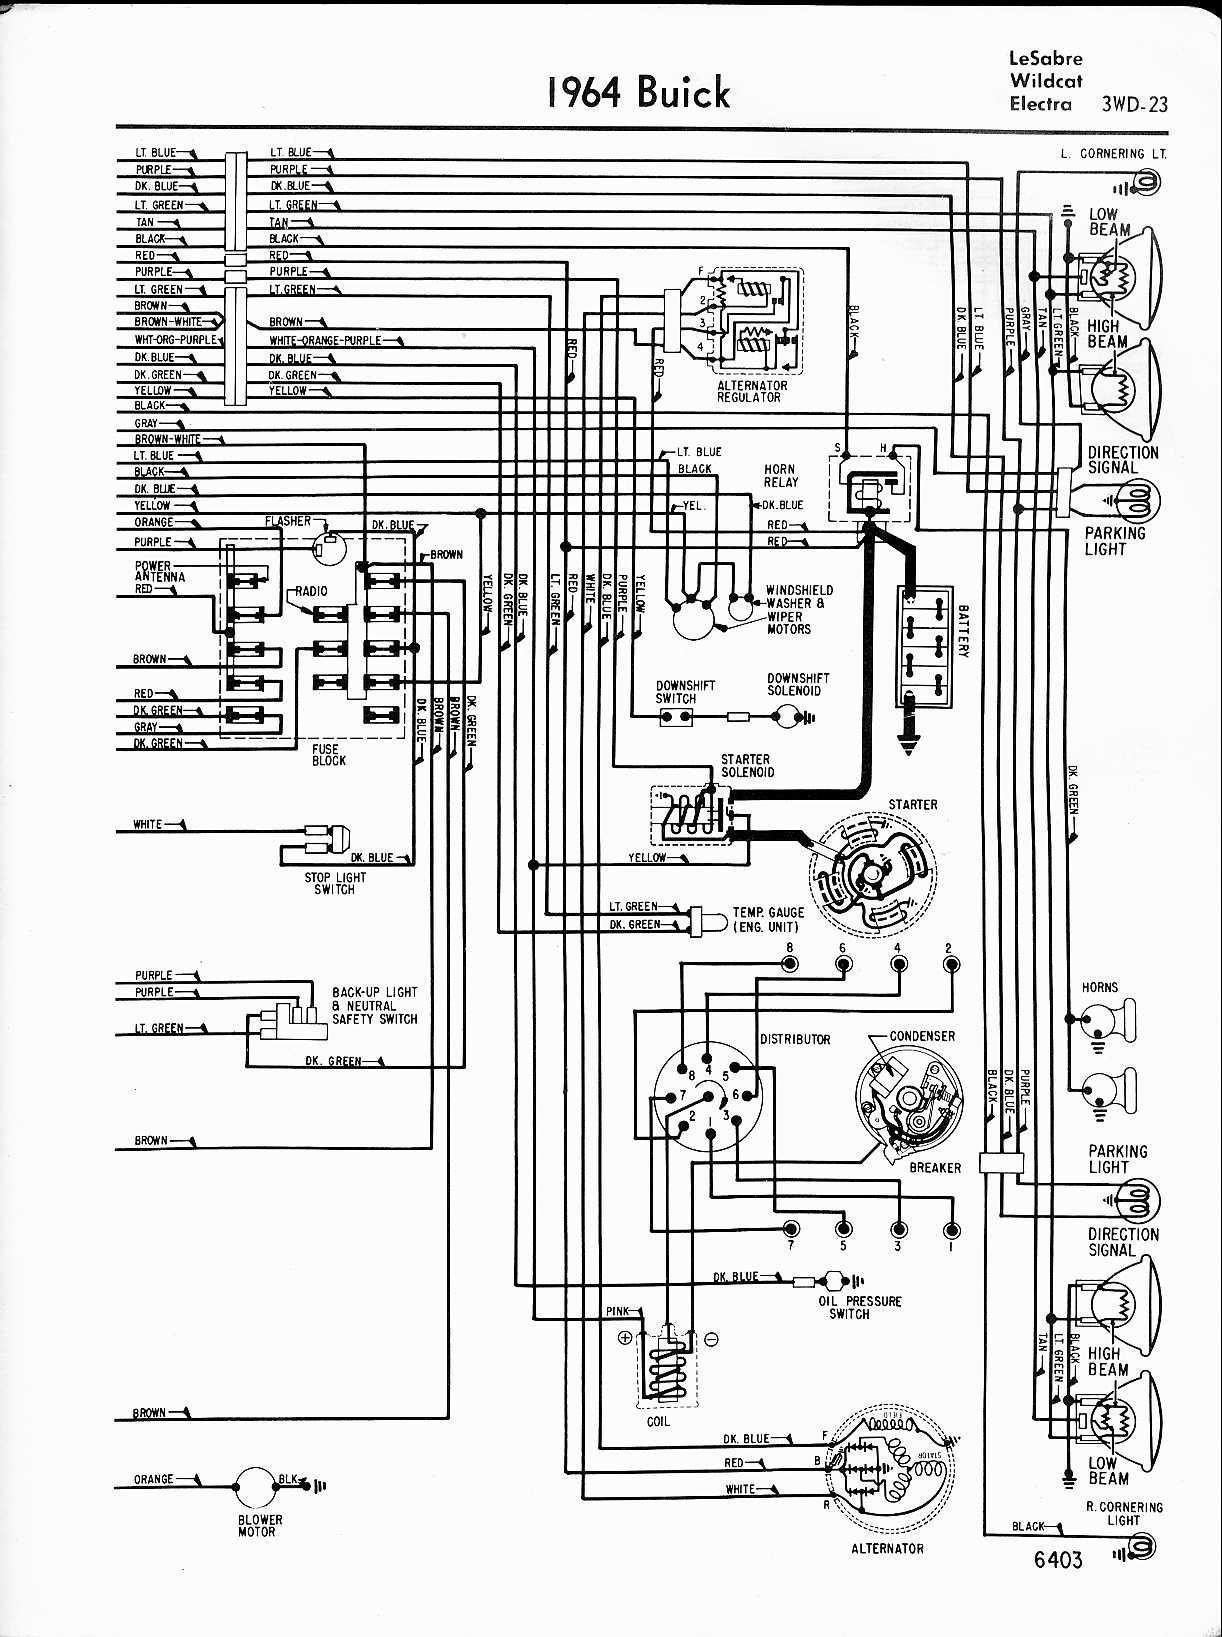 infiniti q45 engine diagram 1997 infiniti i30 fuse box diagram infiniti q45 engine diagram 97 infiniti q45 alternator archives joescablecar of infiniti q45 engine diagram 1997